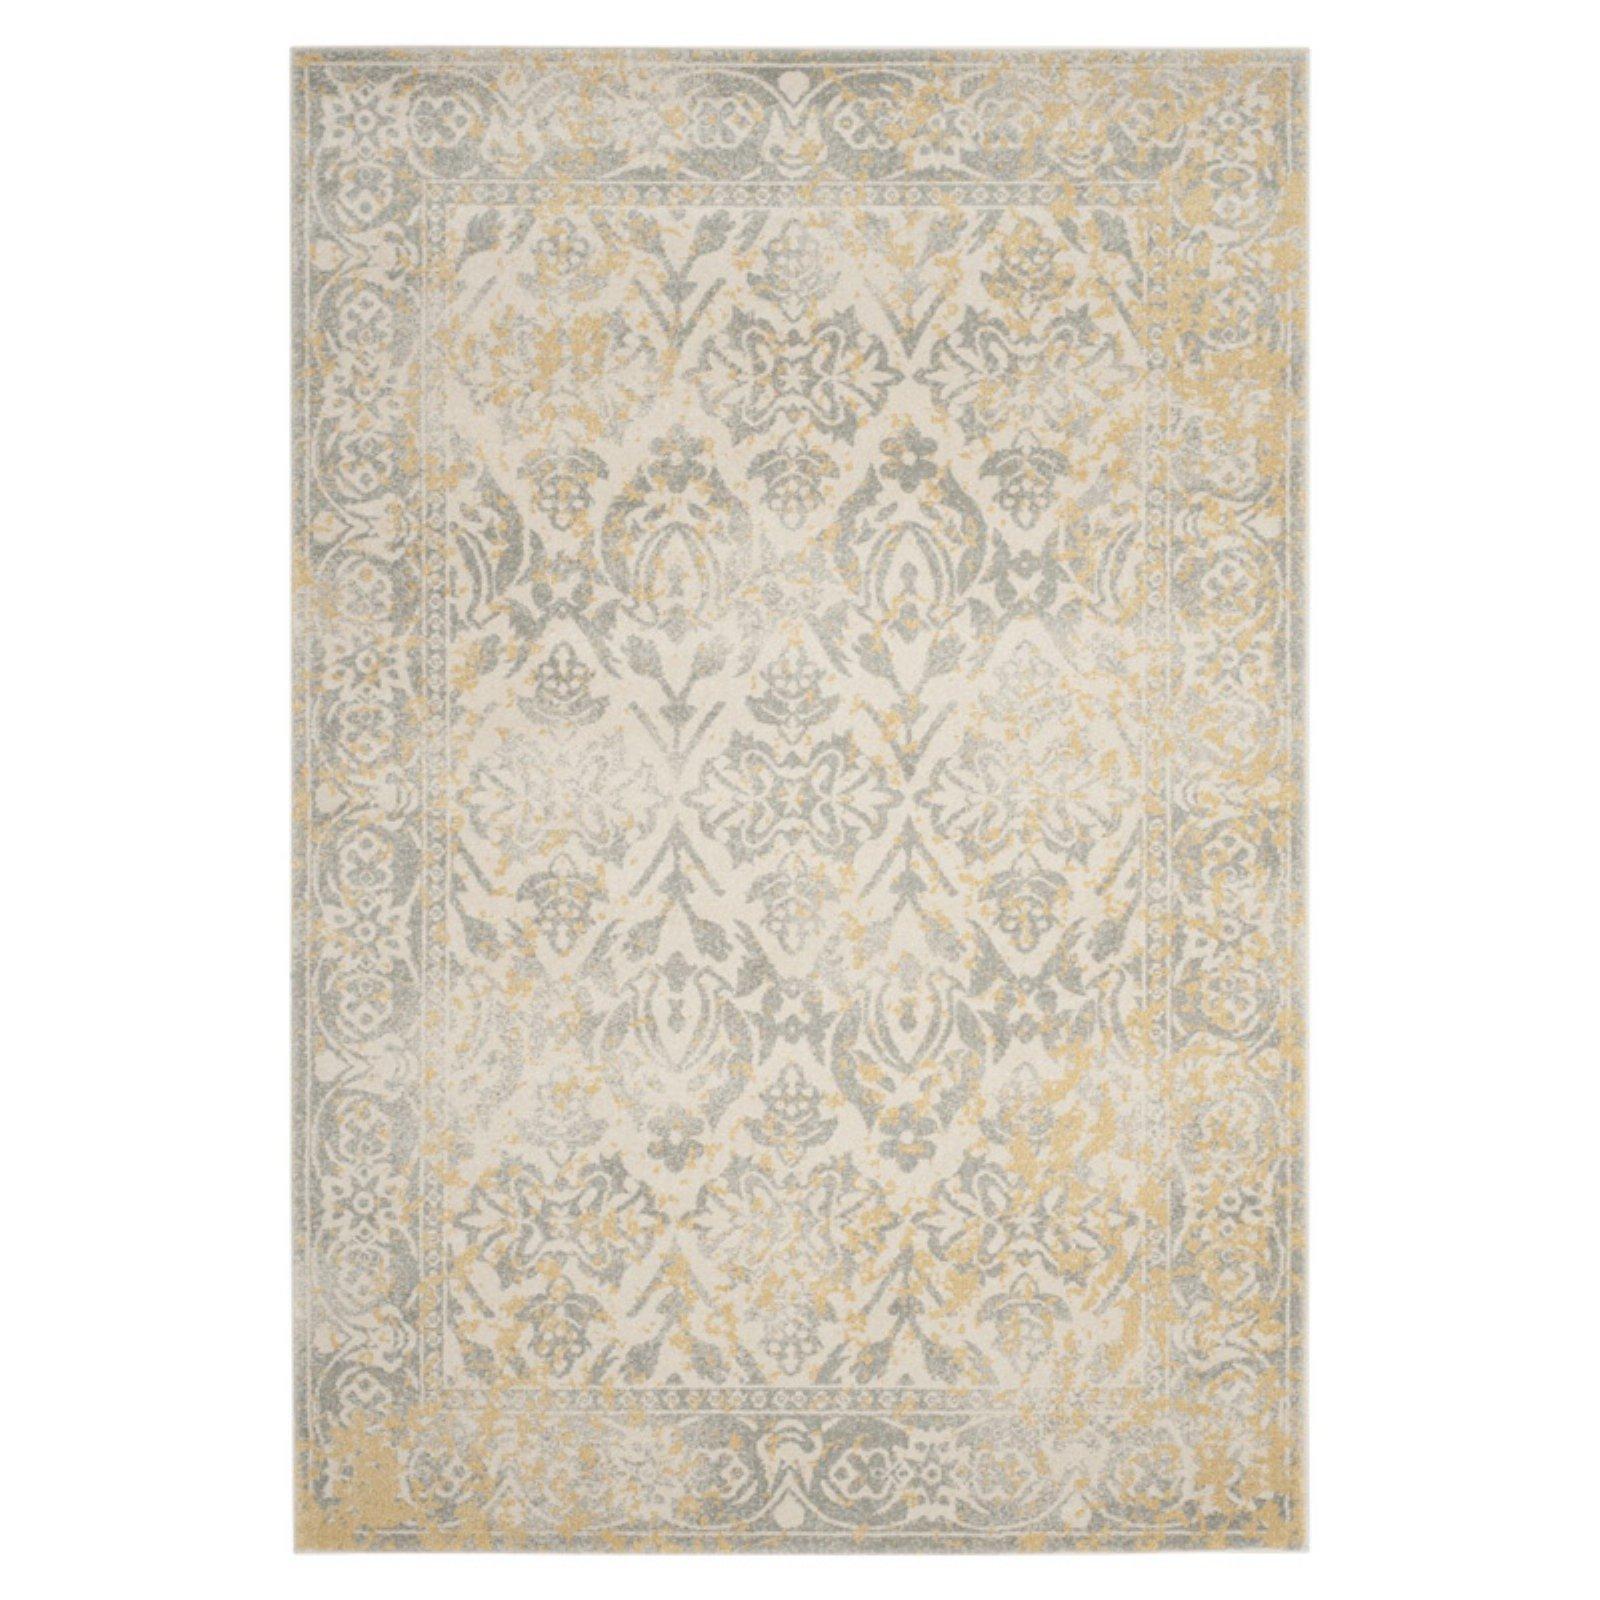 Safavieh Evoke EVK264D Indoor Area Rug - Ivory / Grey